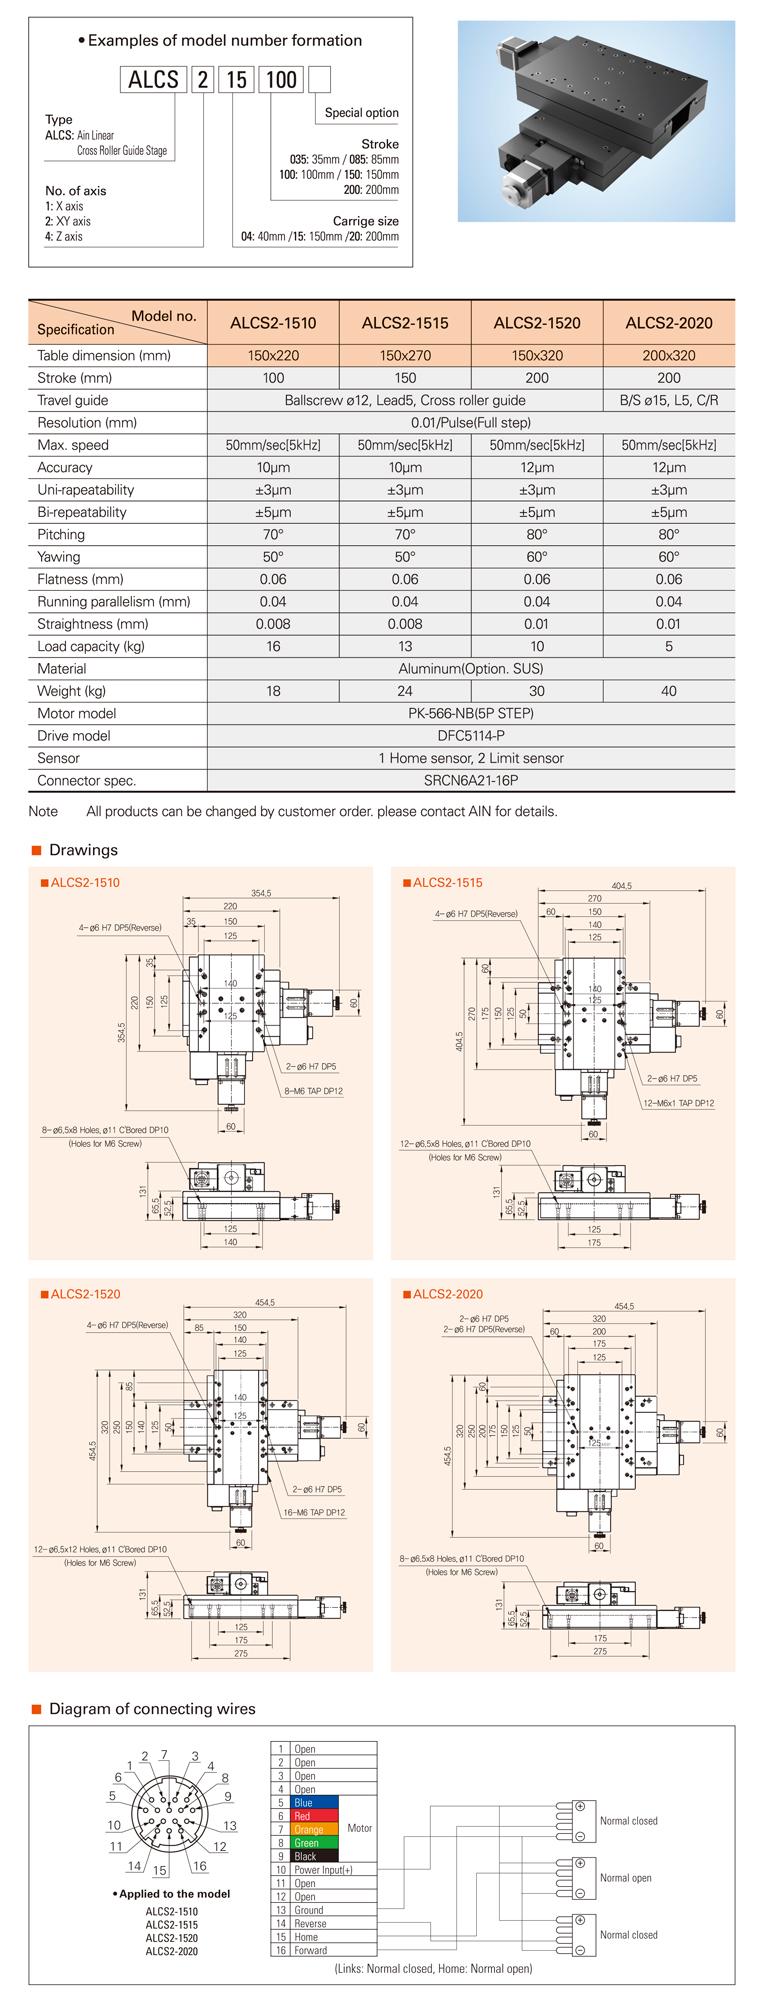 AIN Motorized Linear Cross Roller Guide Stage ALCS2-1510/1515/1520/2020 Type